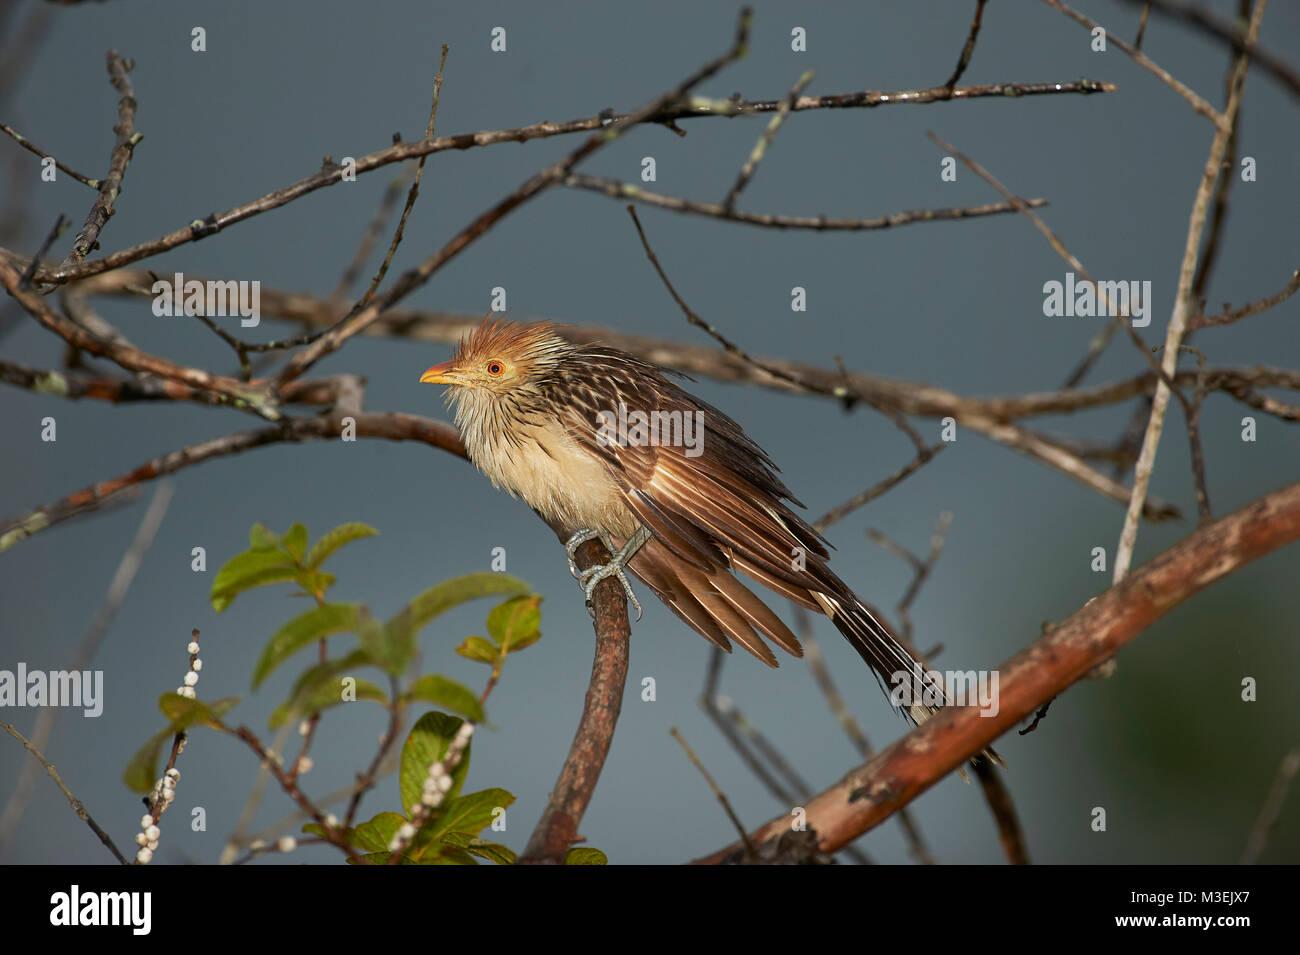 Guira Cuckoo (Guira guira) perched in a tree, Araras Ecolodge,  Mato Grosso, Brazil - Stock Image